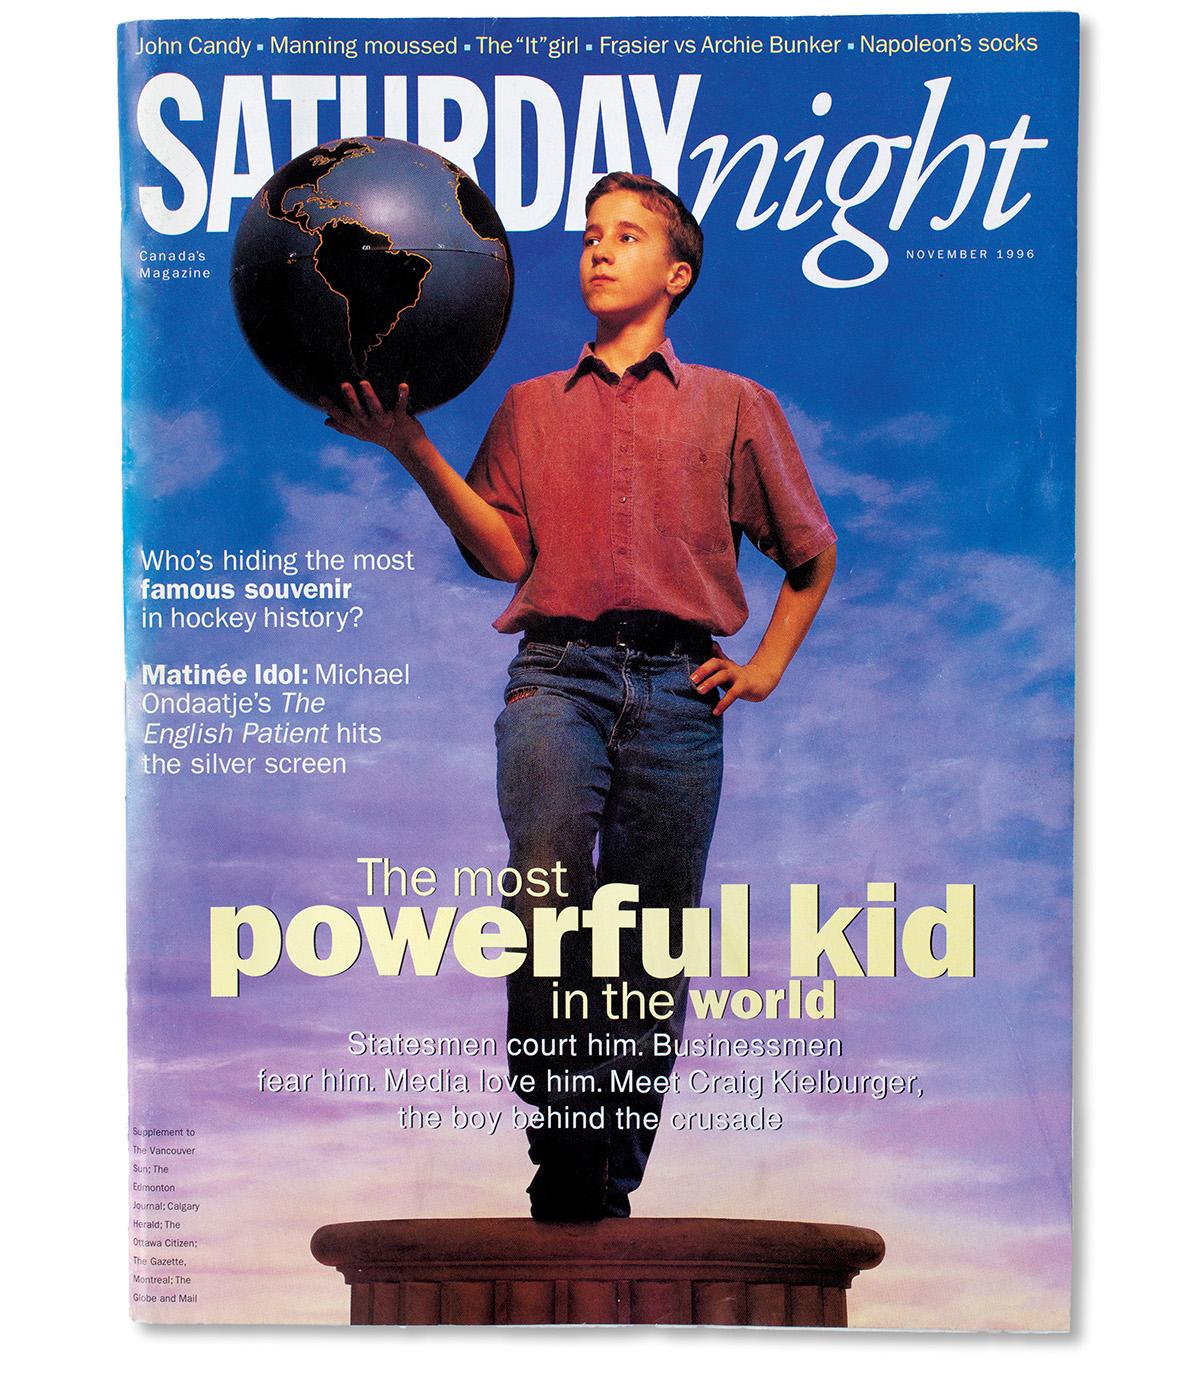 November 1996 issue of Saturday Night magazine (Photograph by Liz Sullivan)